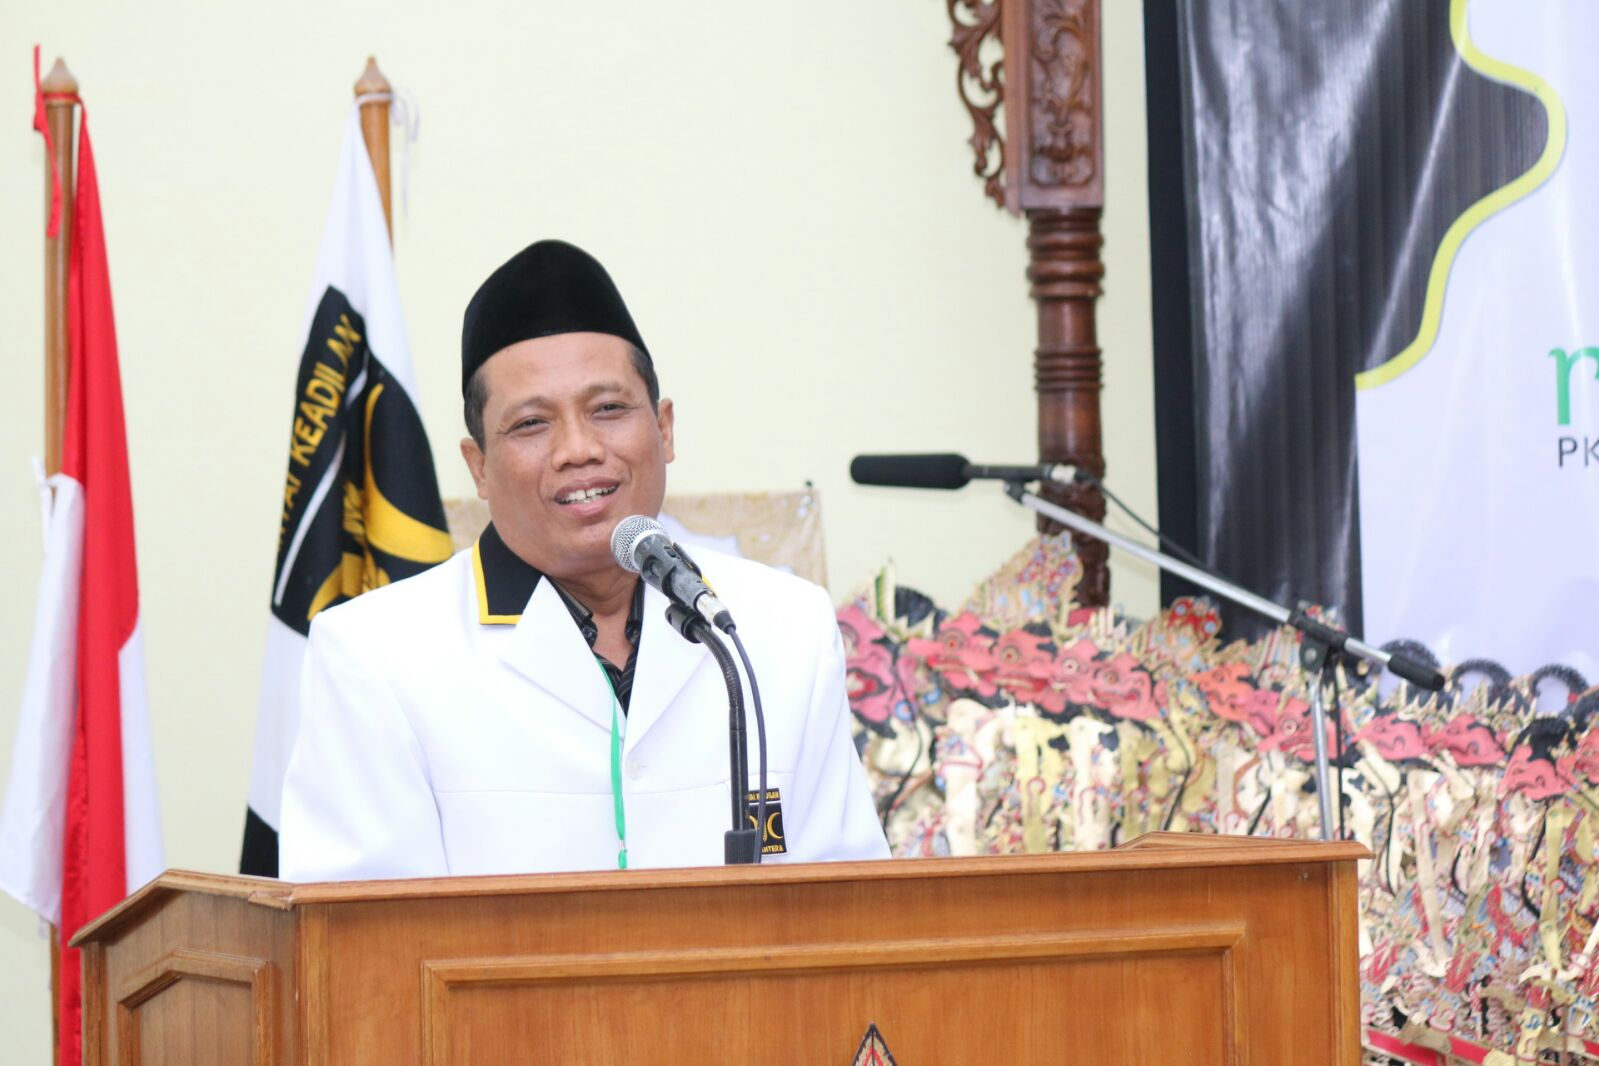 Ketua DPW PKS Jateng periode 2015-2020 Kamal Fauzi. (Foto: pksjateng.or.id)